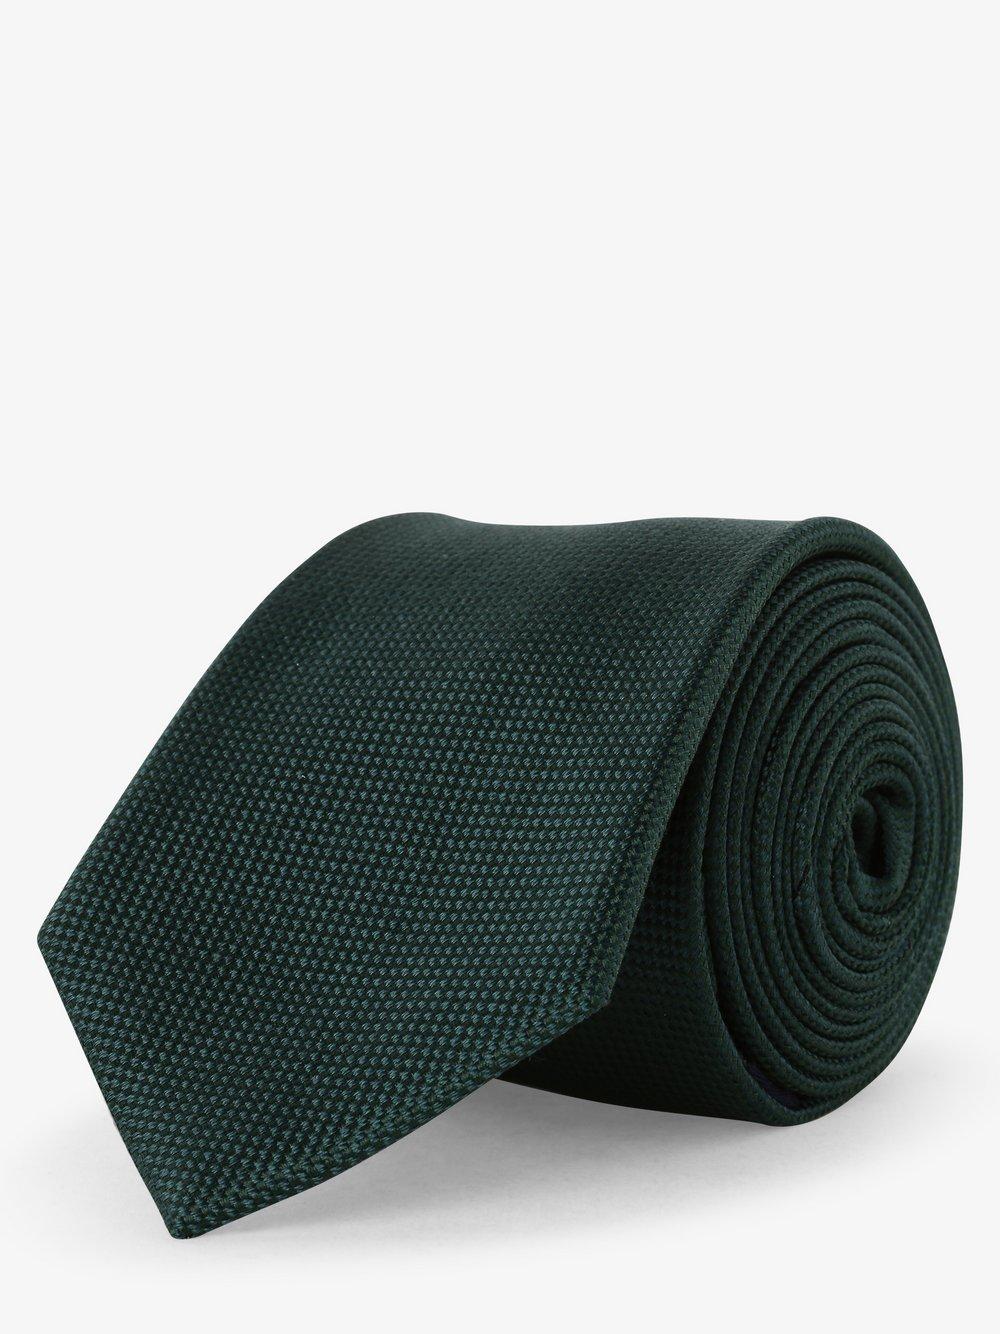 Mc Earl – Krawat jedwabny męski, zielony Van Graaf 490590-0001-00000